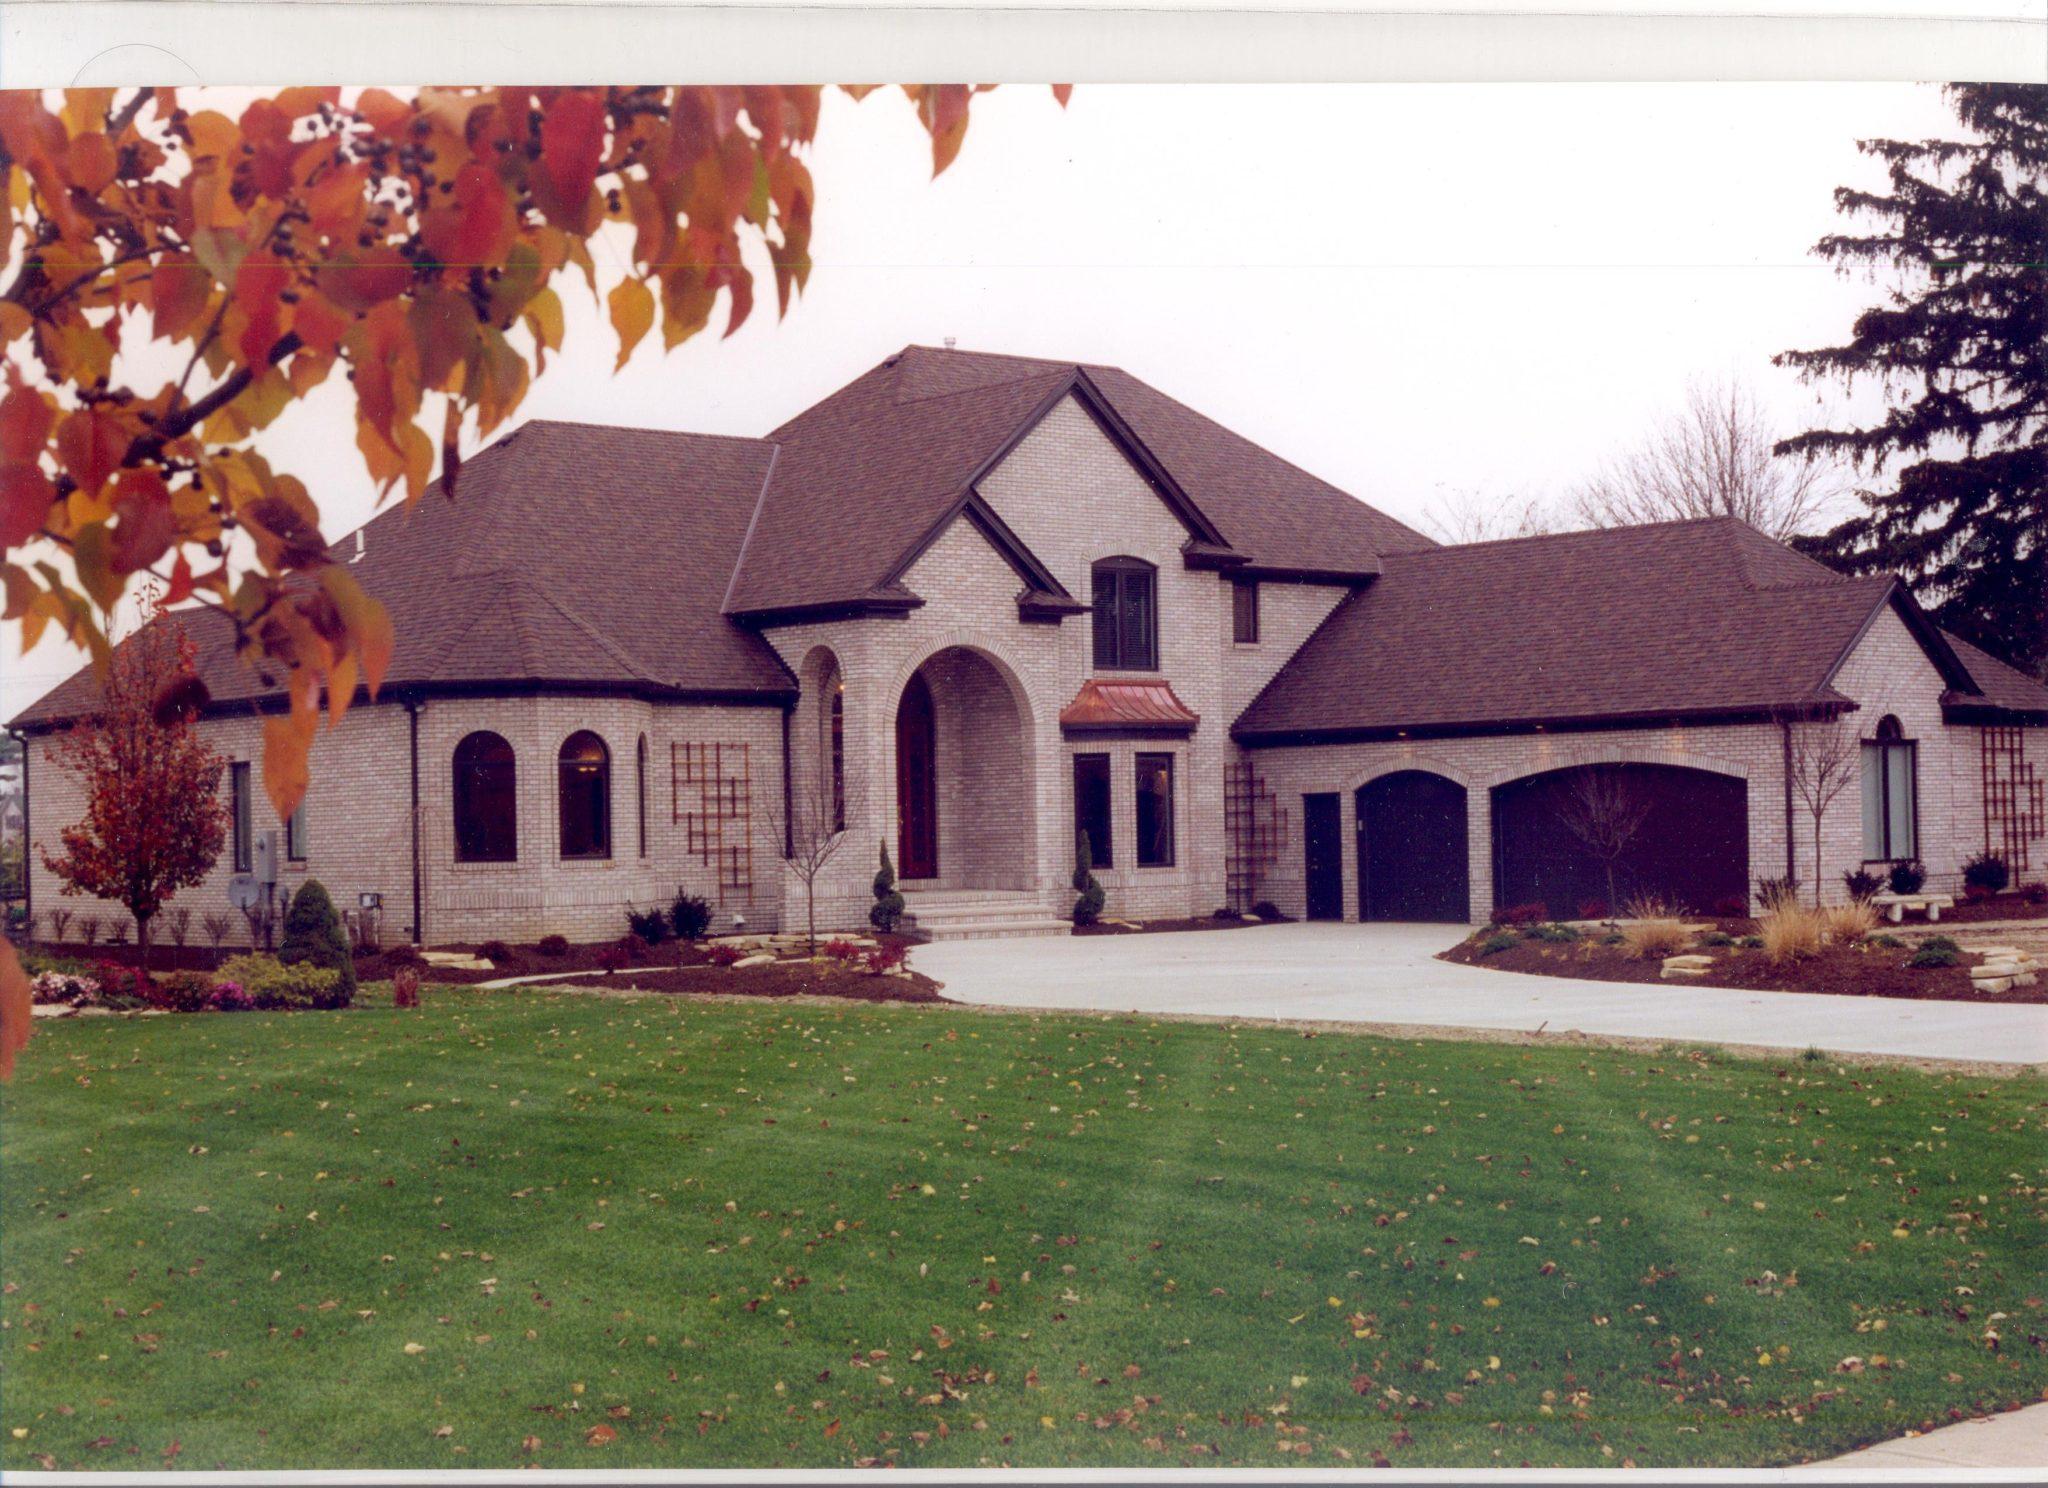 Custom Home from Galik Building in Avon OH